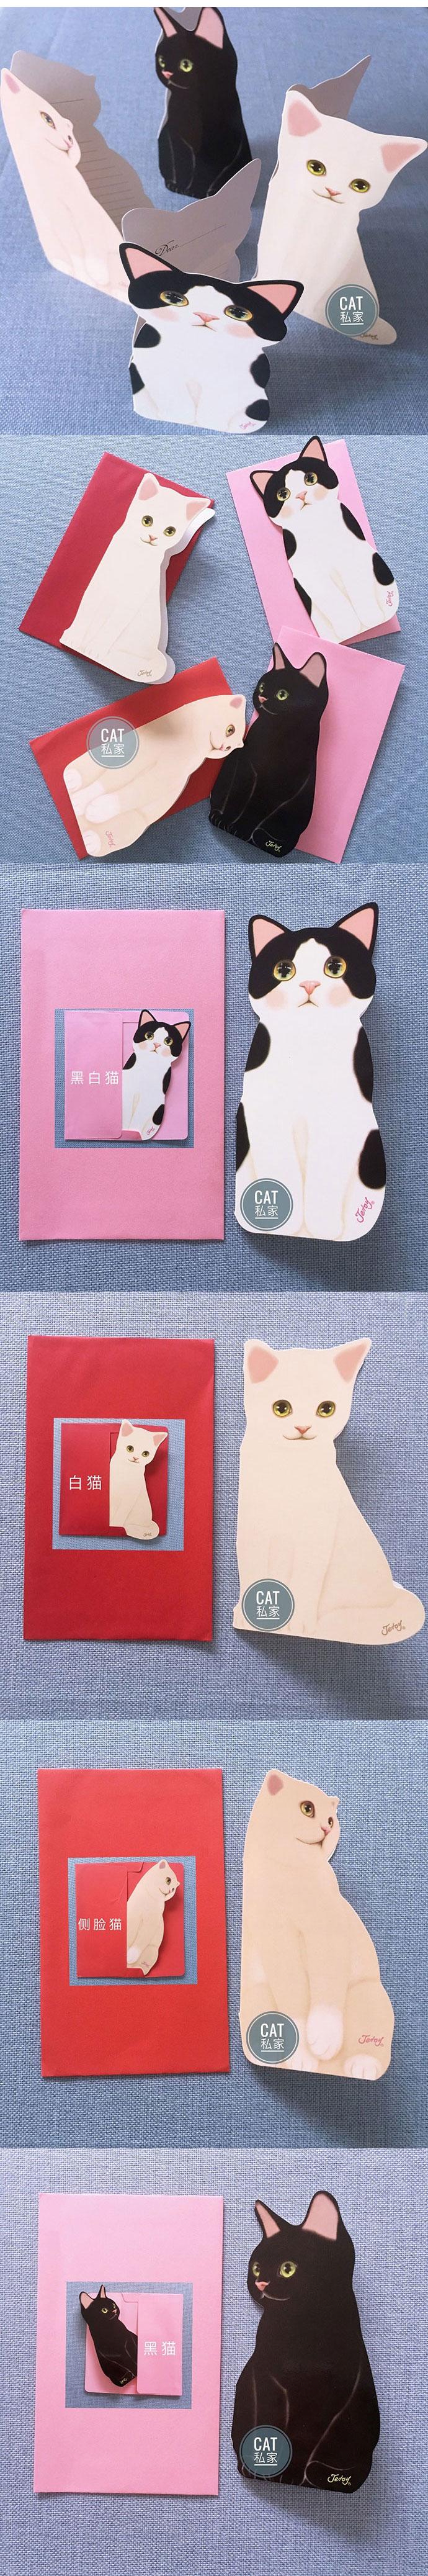 Jetoy Choo 大眼小猫咪卡片